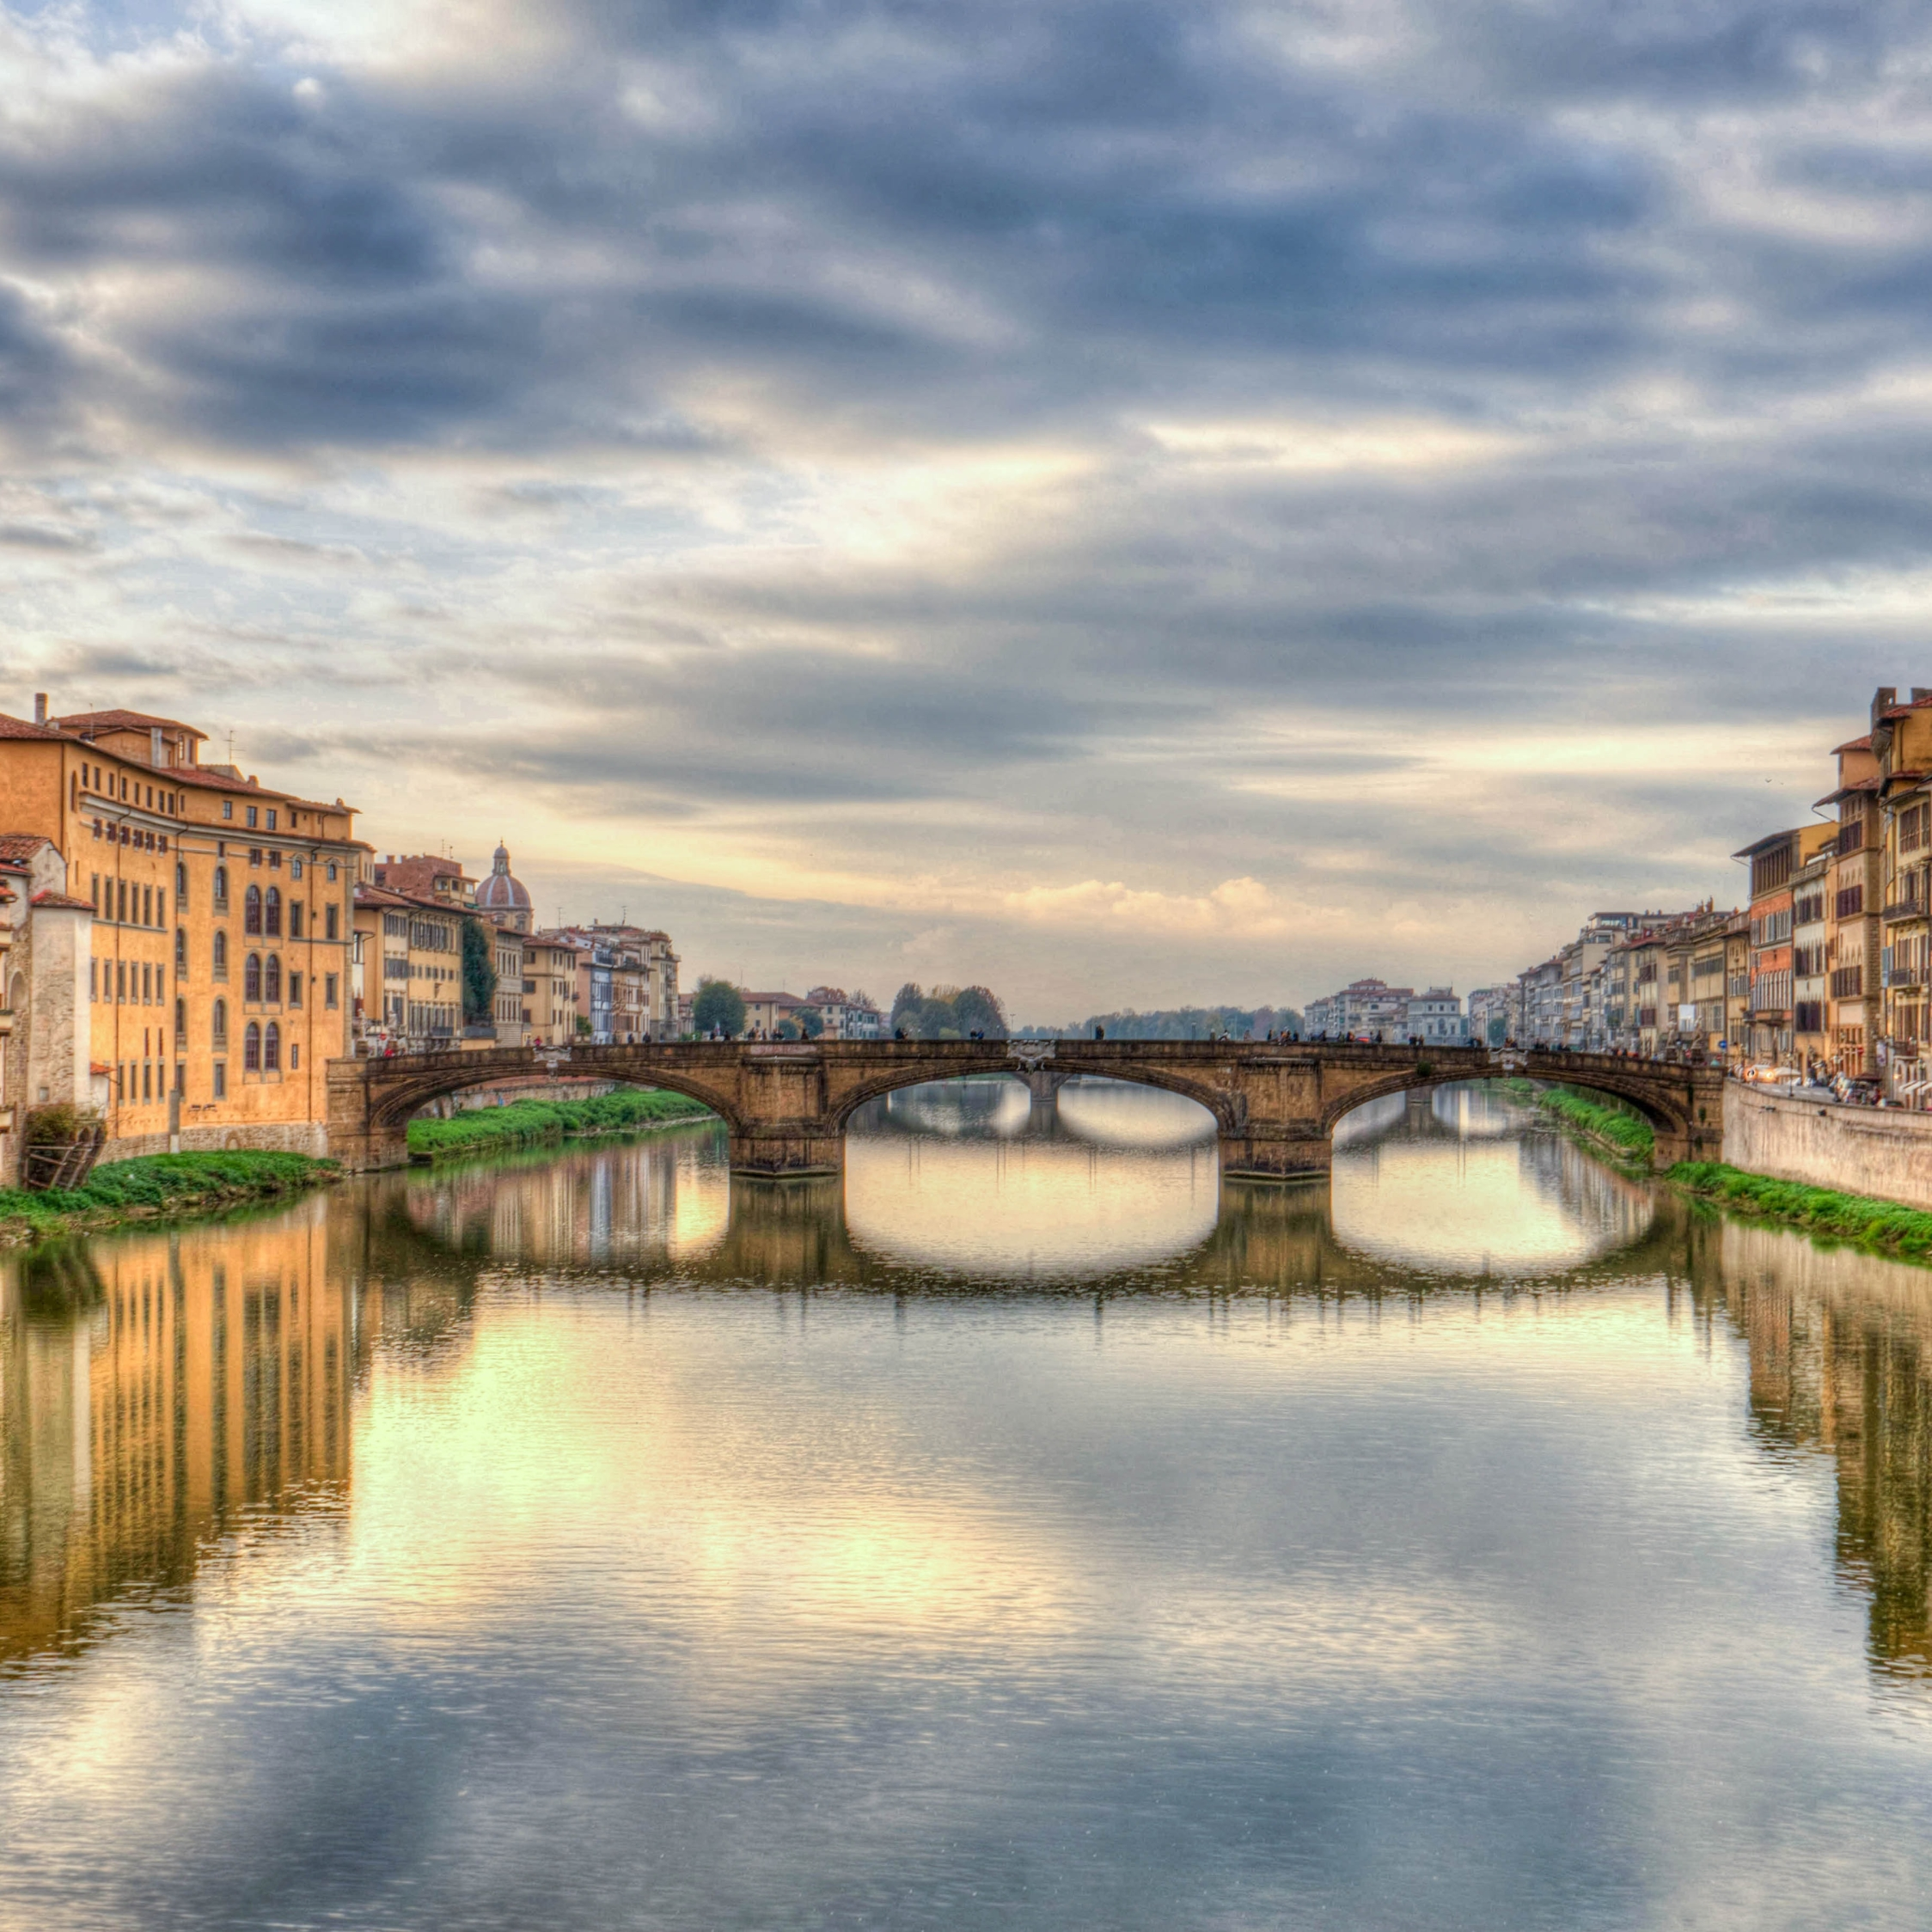 Florence, Italy, Bridge, HD 8K Wallpaper